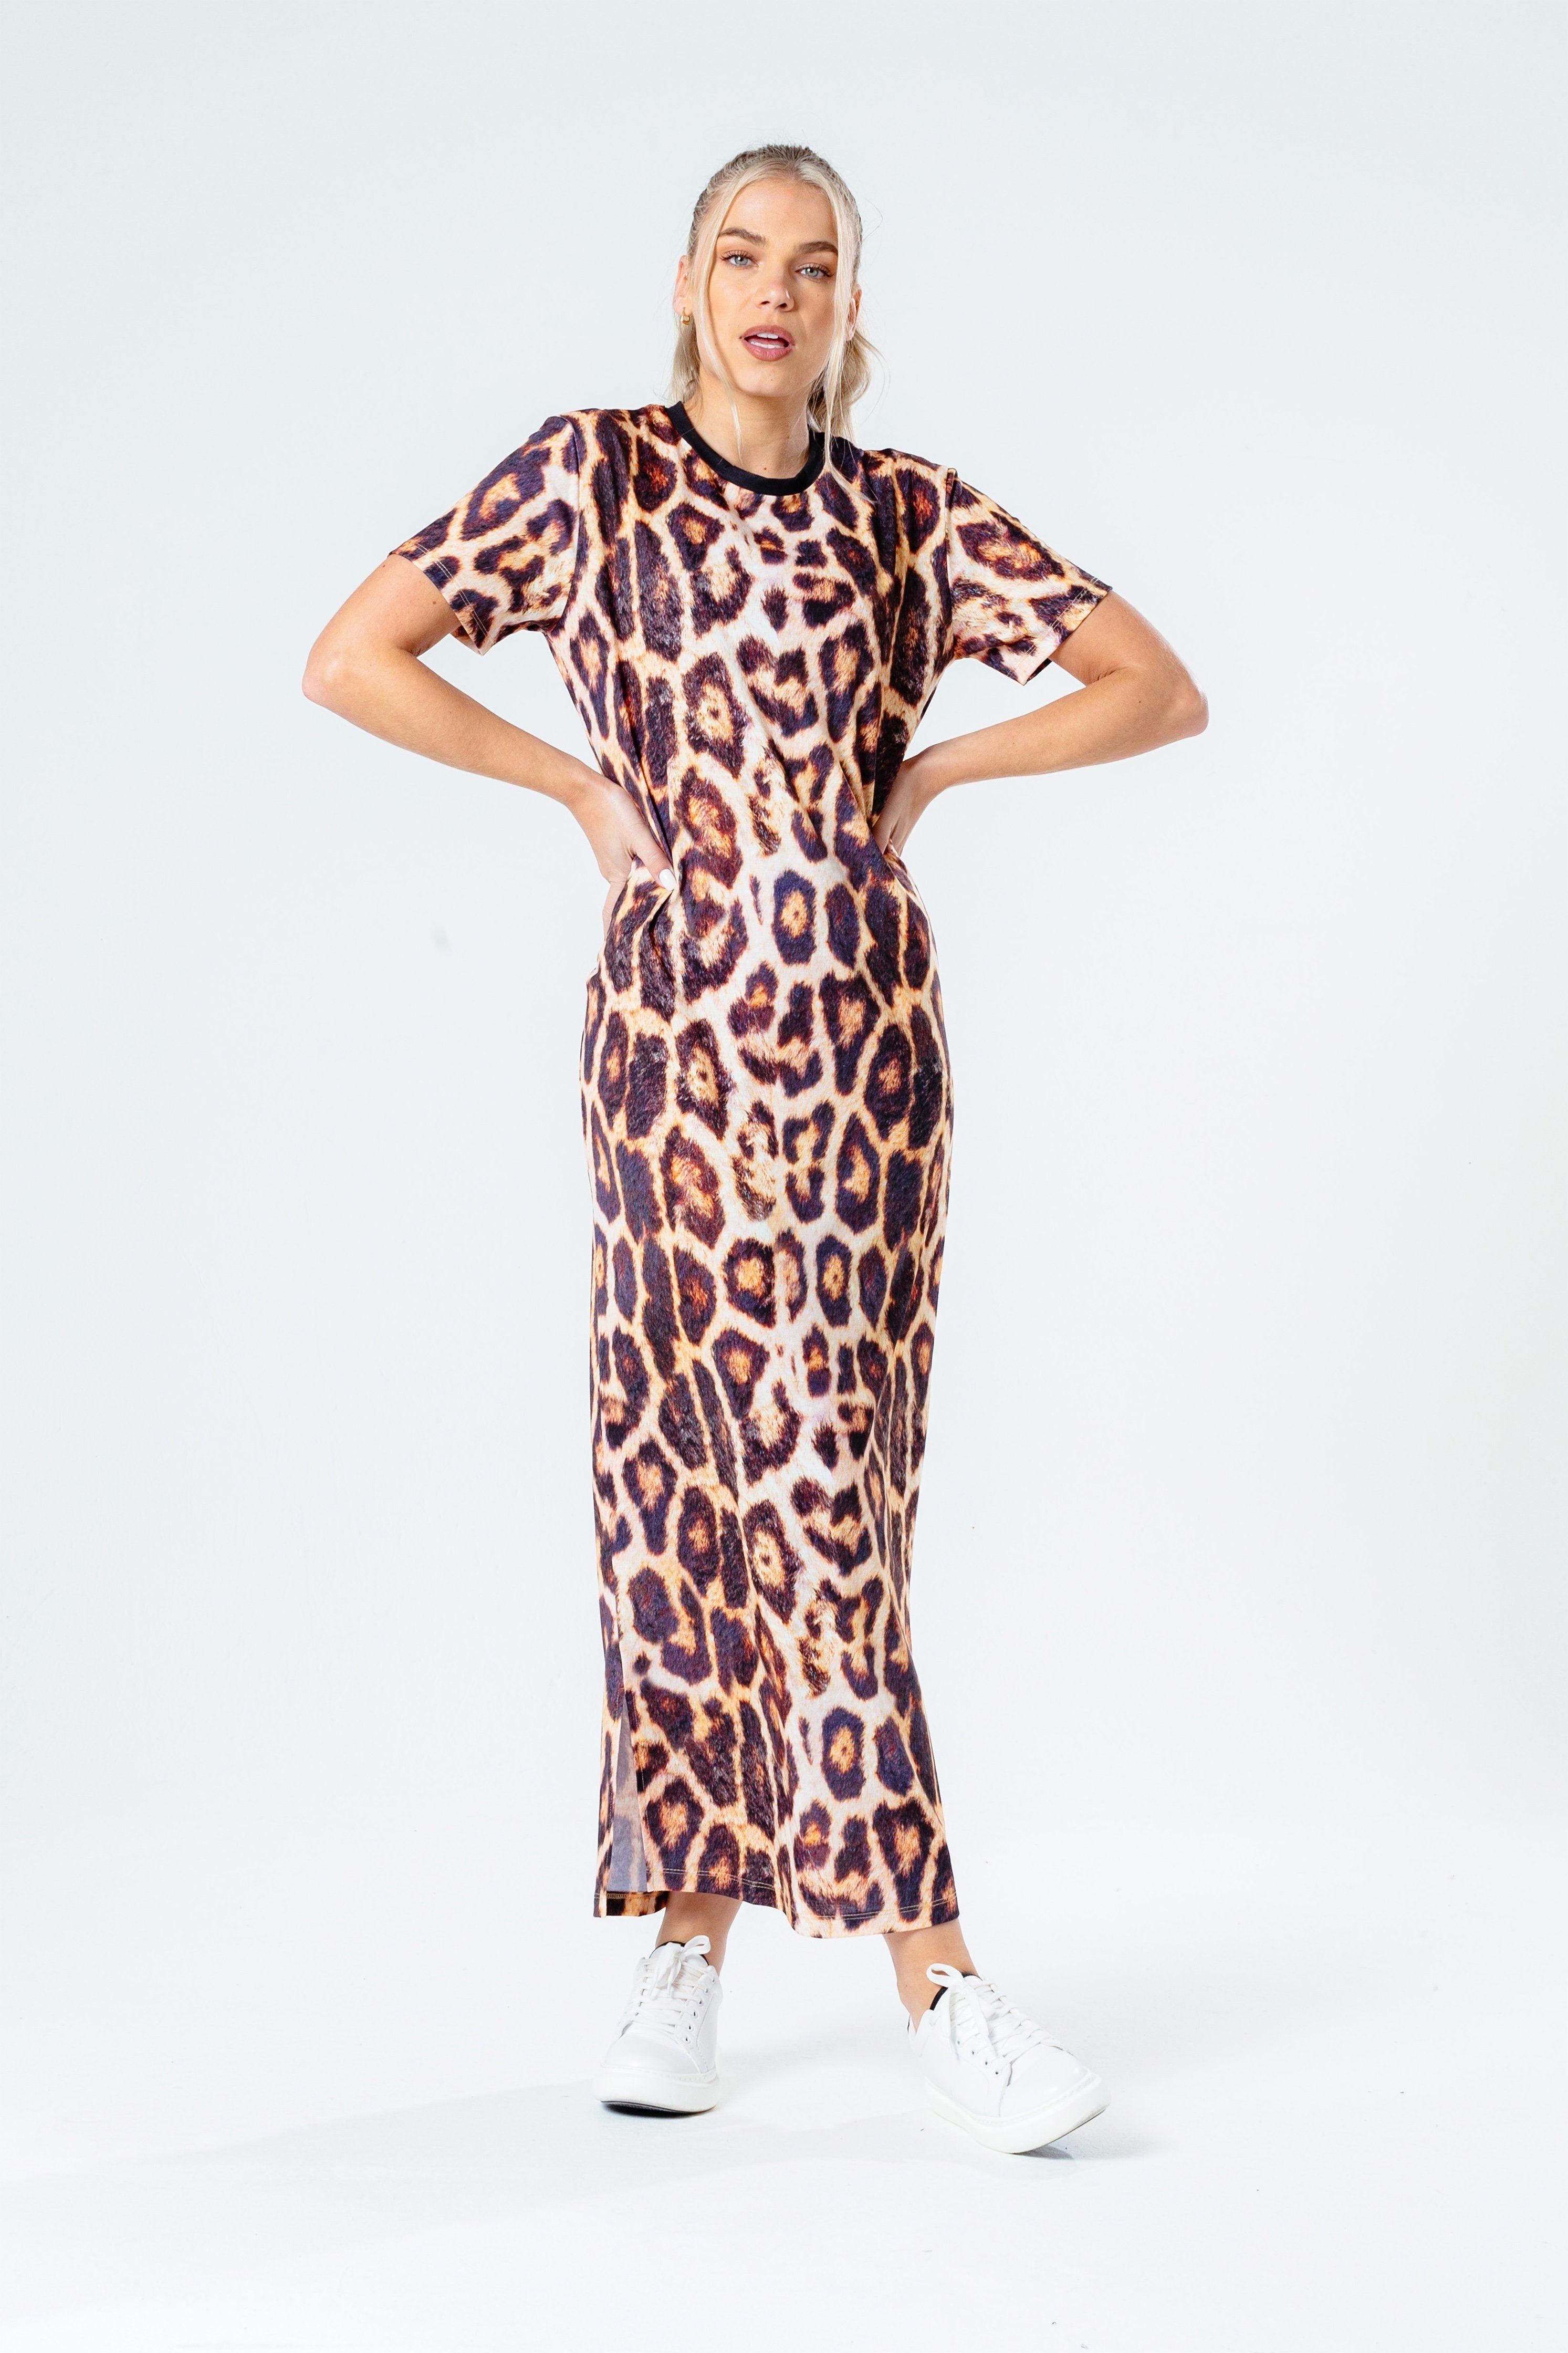 HYPE LEOPARD WOMEN'S MAXI DRESS